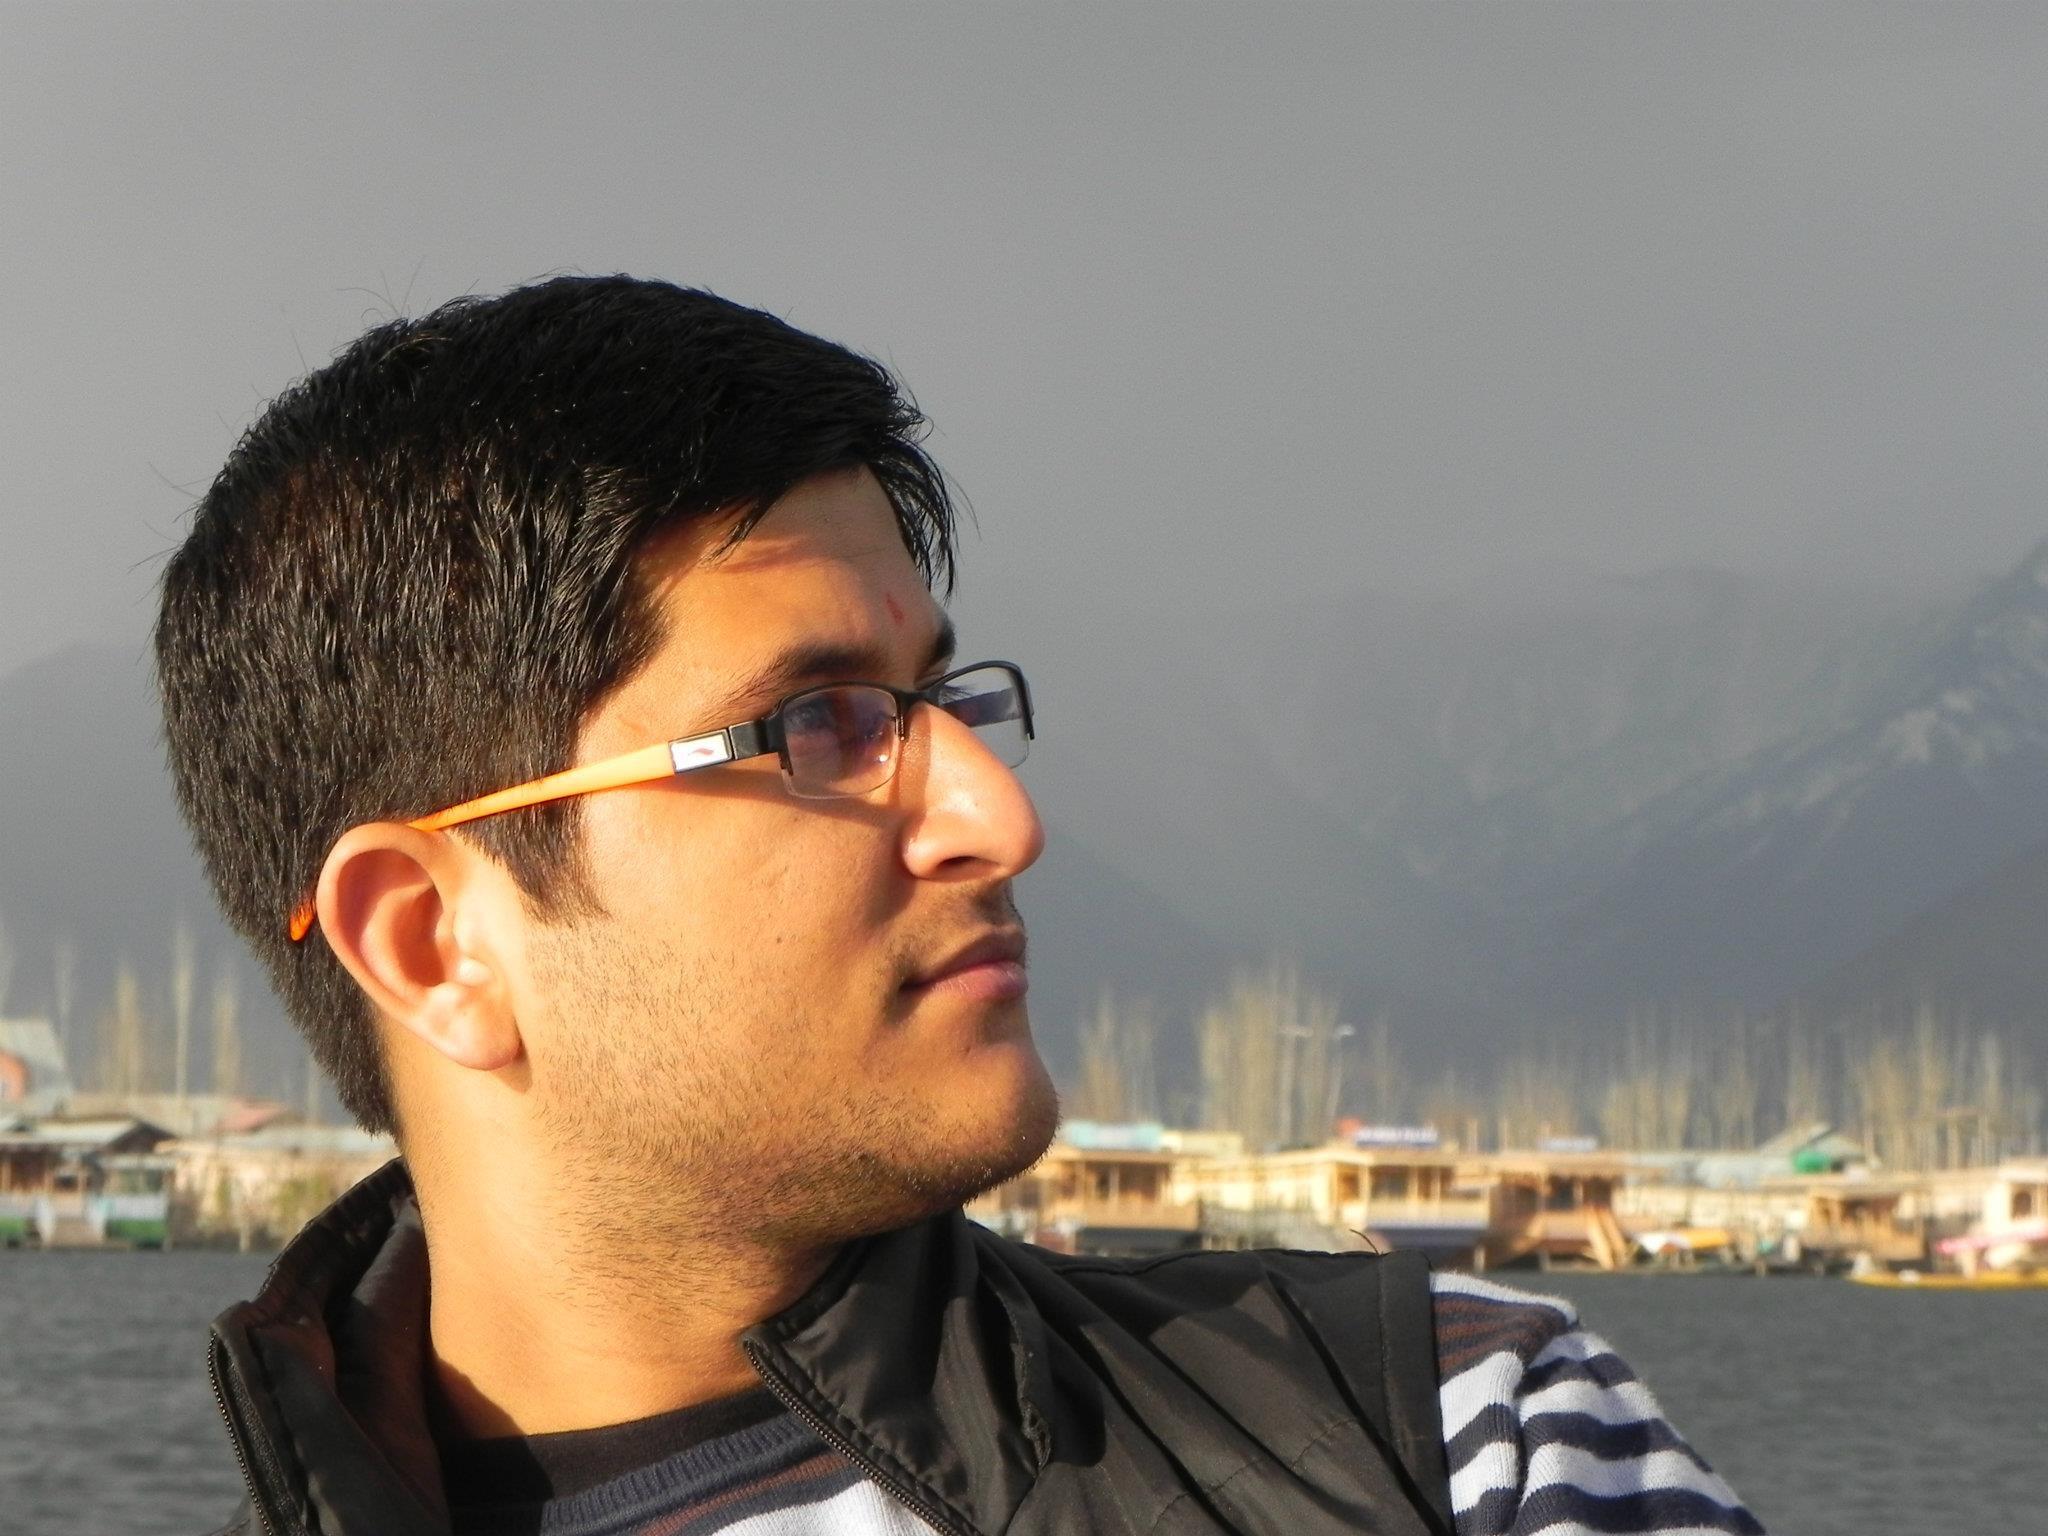 Free Unsplash photo from Akash Jangra